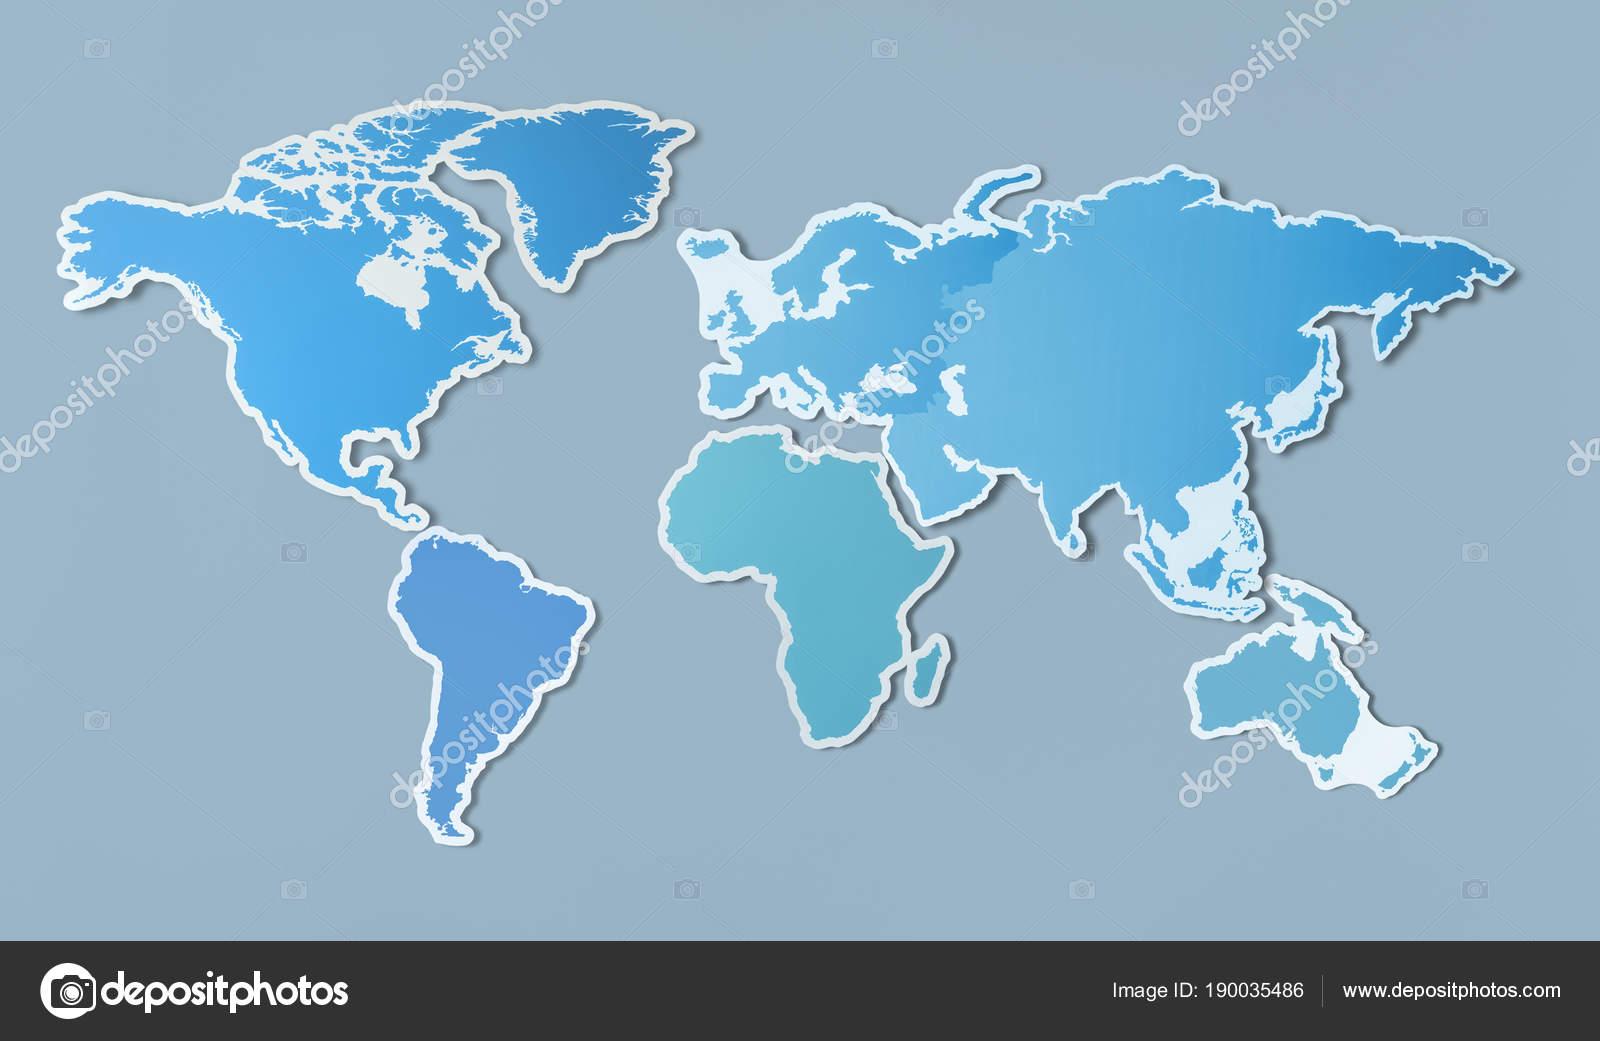 Free Blank Map Asia — Stock Photo © Rawpixel #190035486